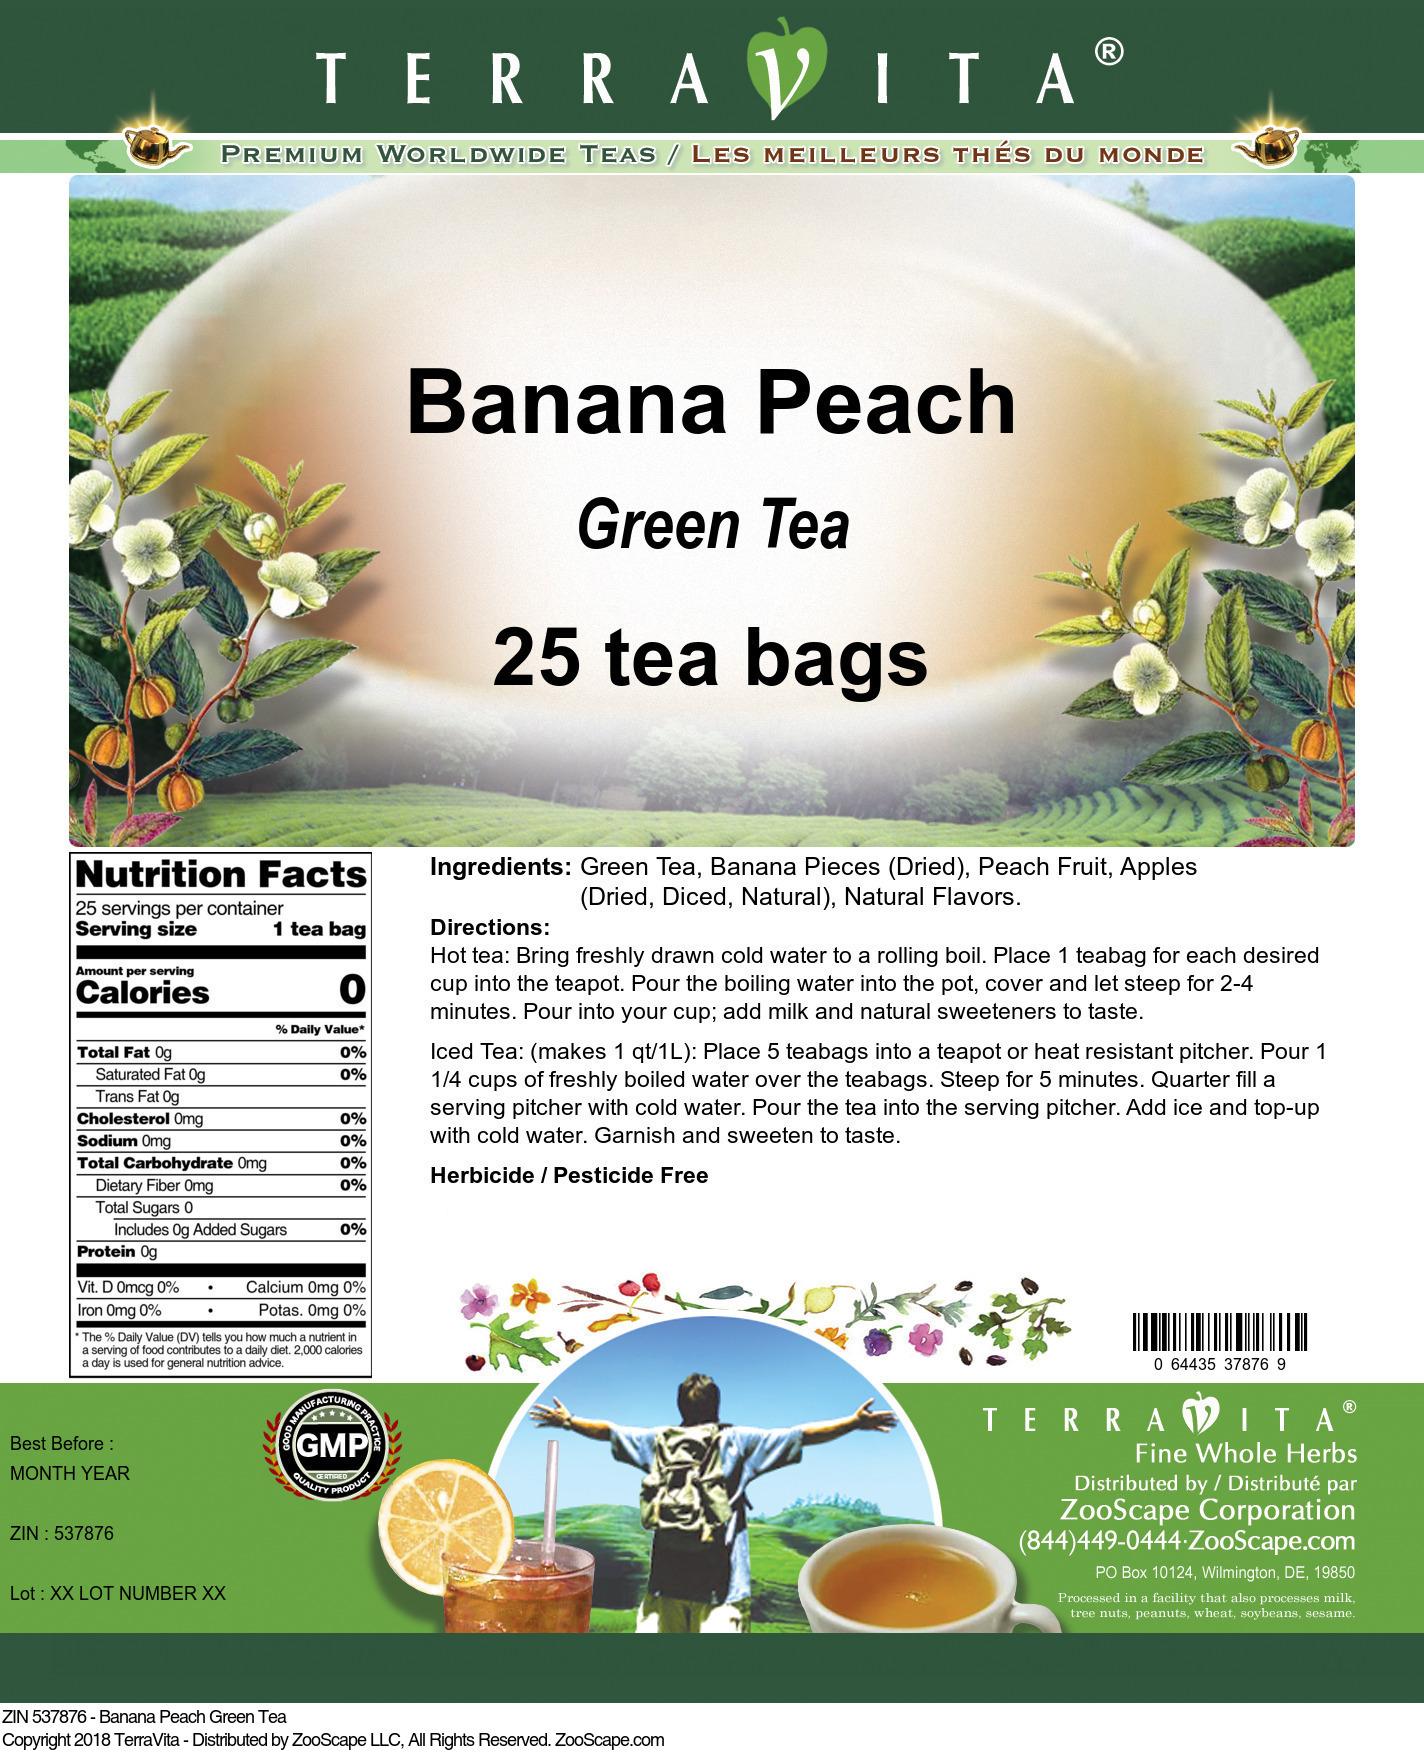 Banana Peach Green Tea